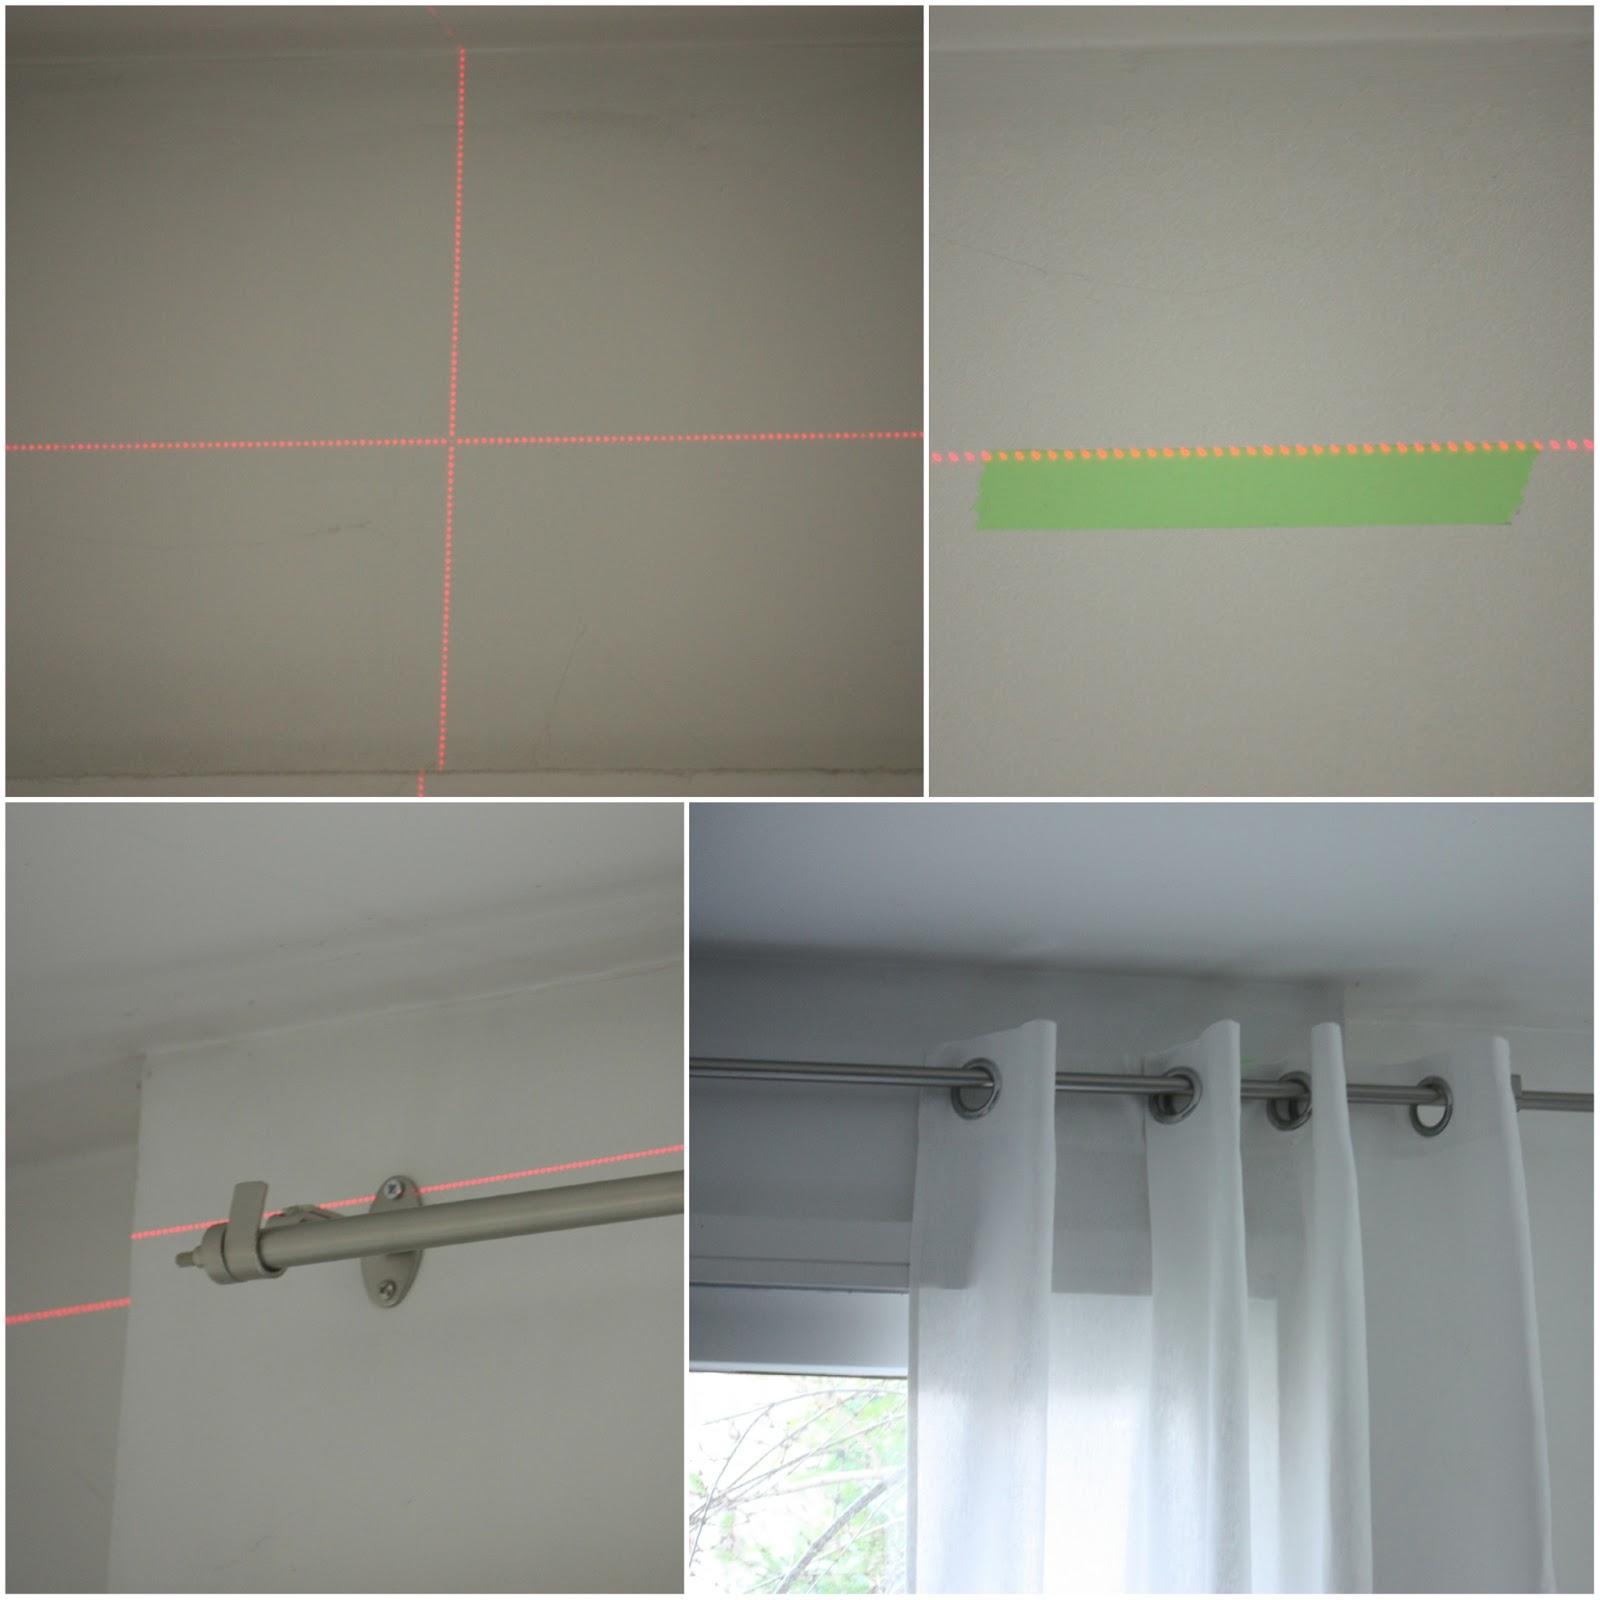 Un nouveau regard niveau laser quigo 2 par bosch - Niveau laser bosch quigo ...